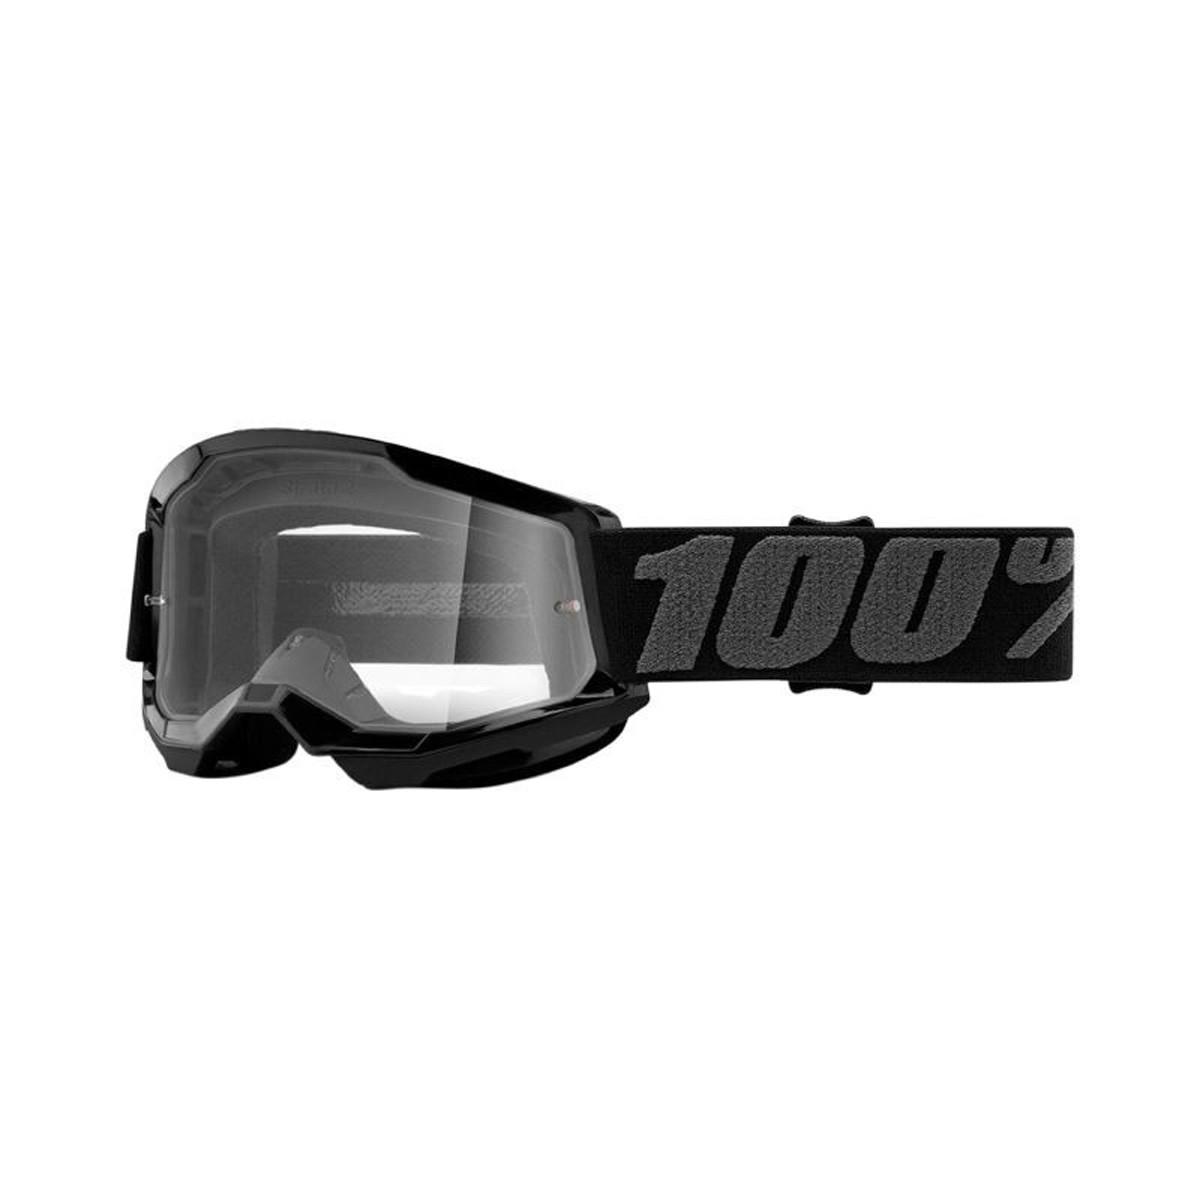 Masque / Lunettes Cross - 100% Strata 2 Junior Noir Ecran Transparent